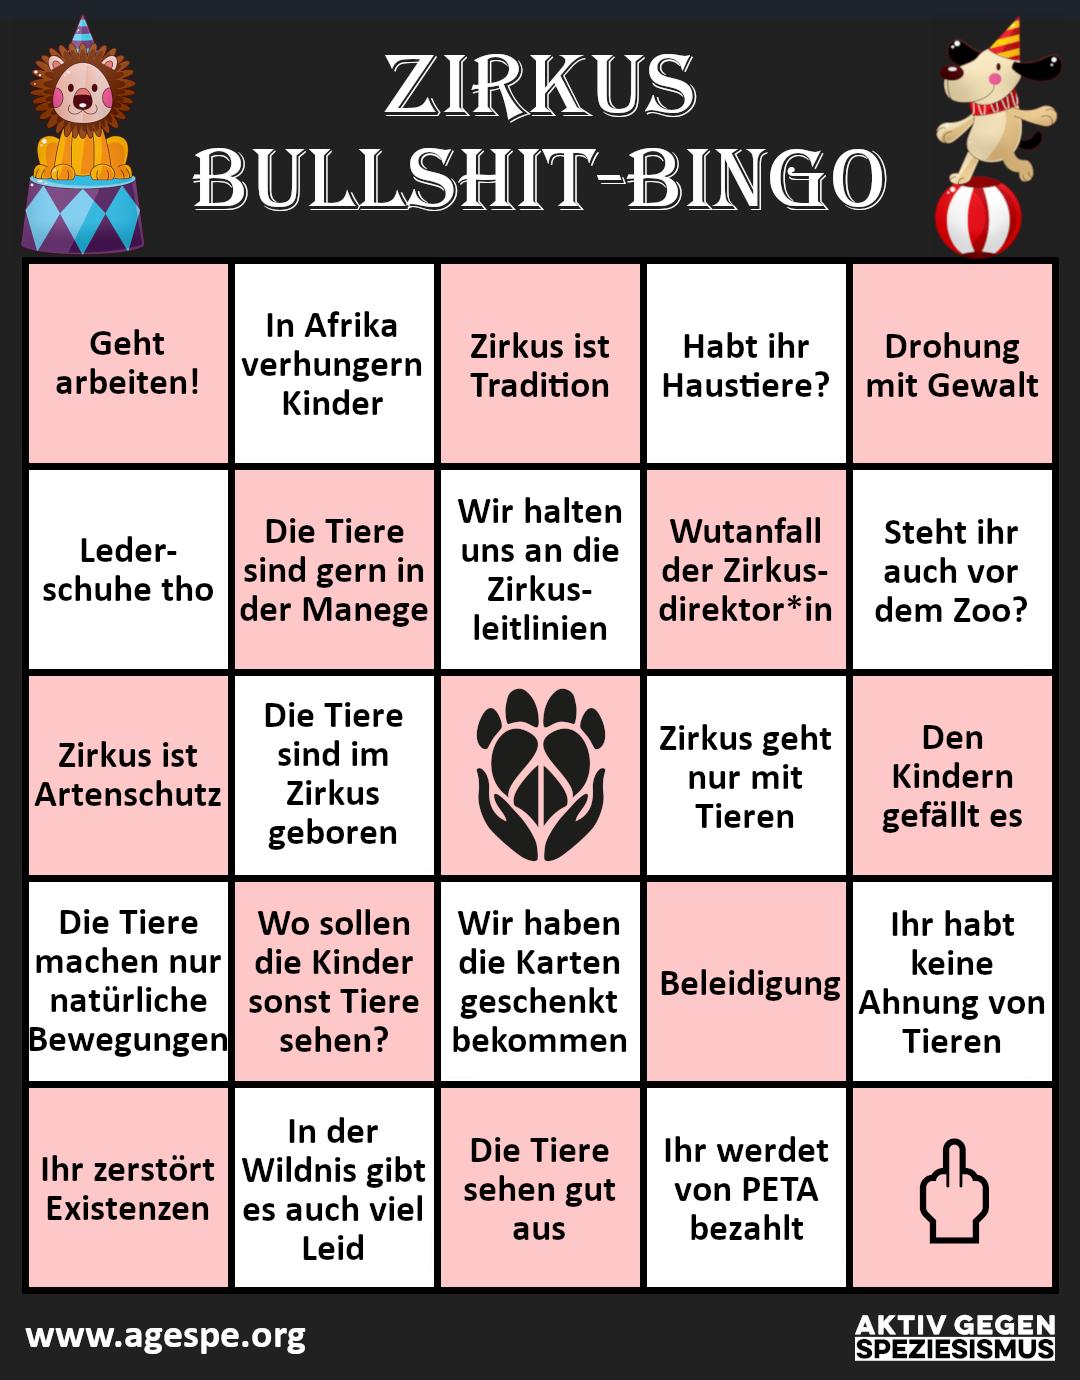 Zirkus Bullshit Bingo